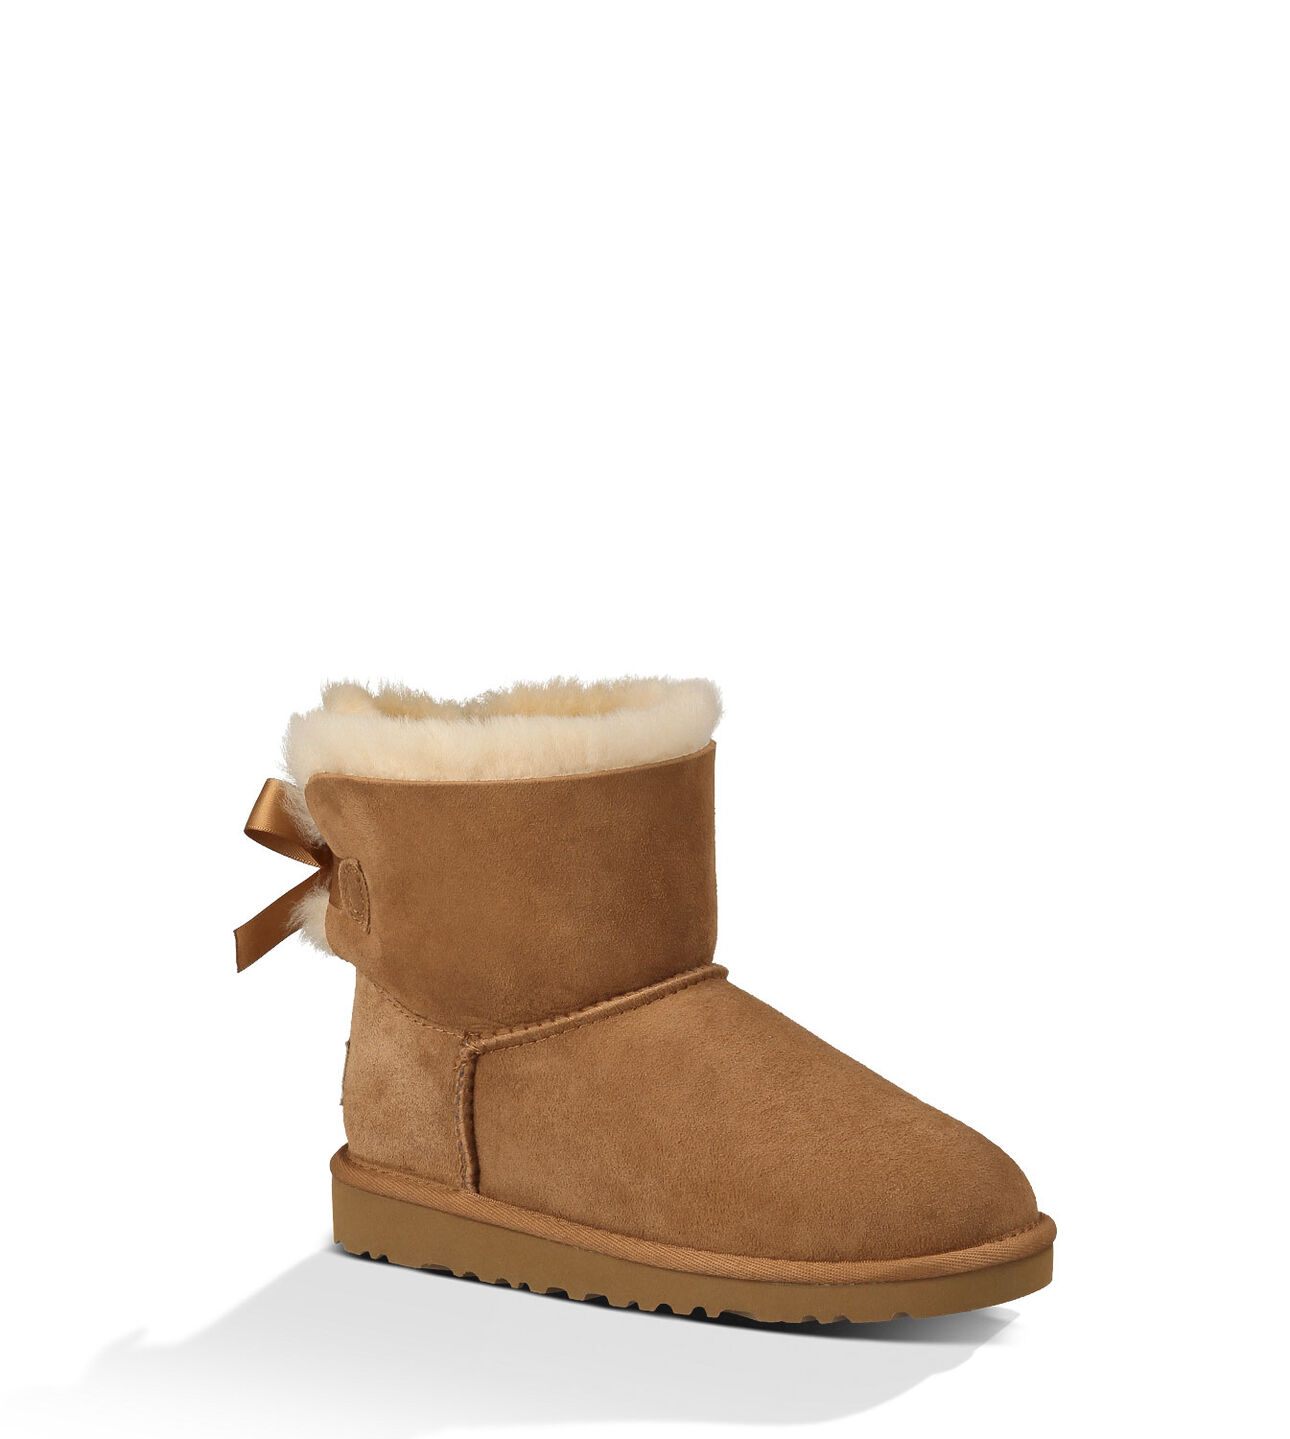 ugg boots uk outlet co